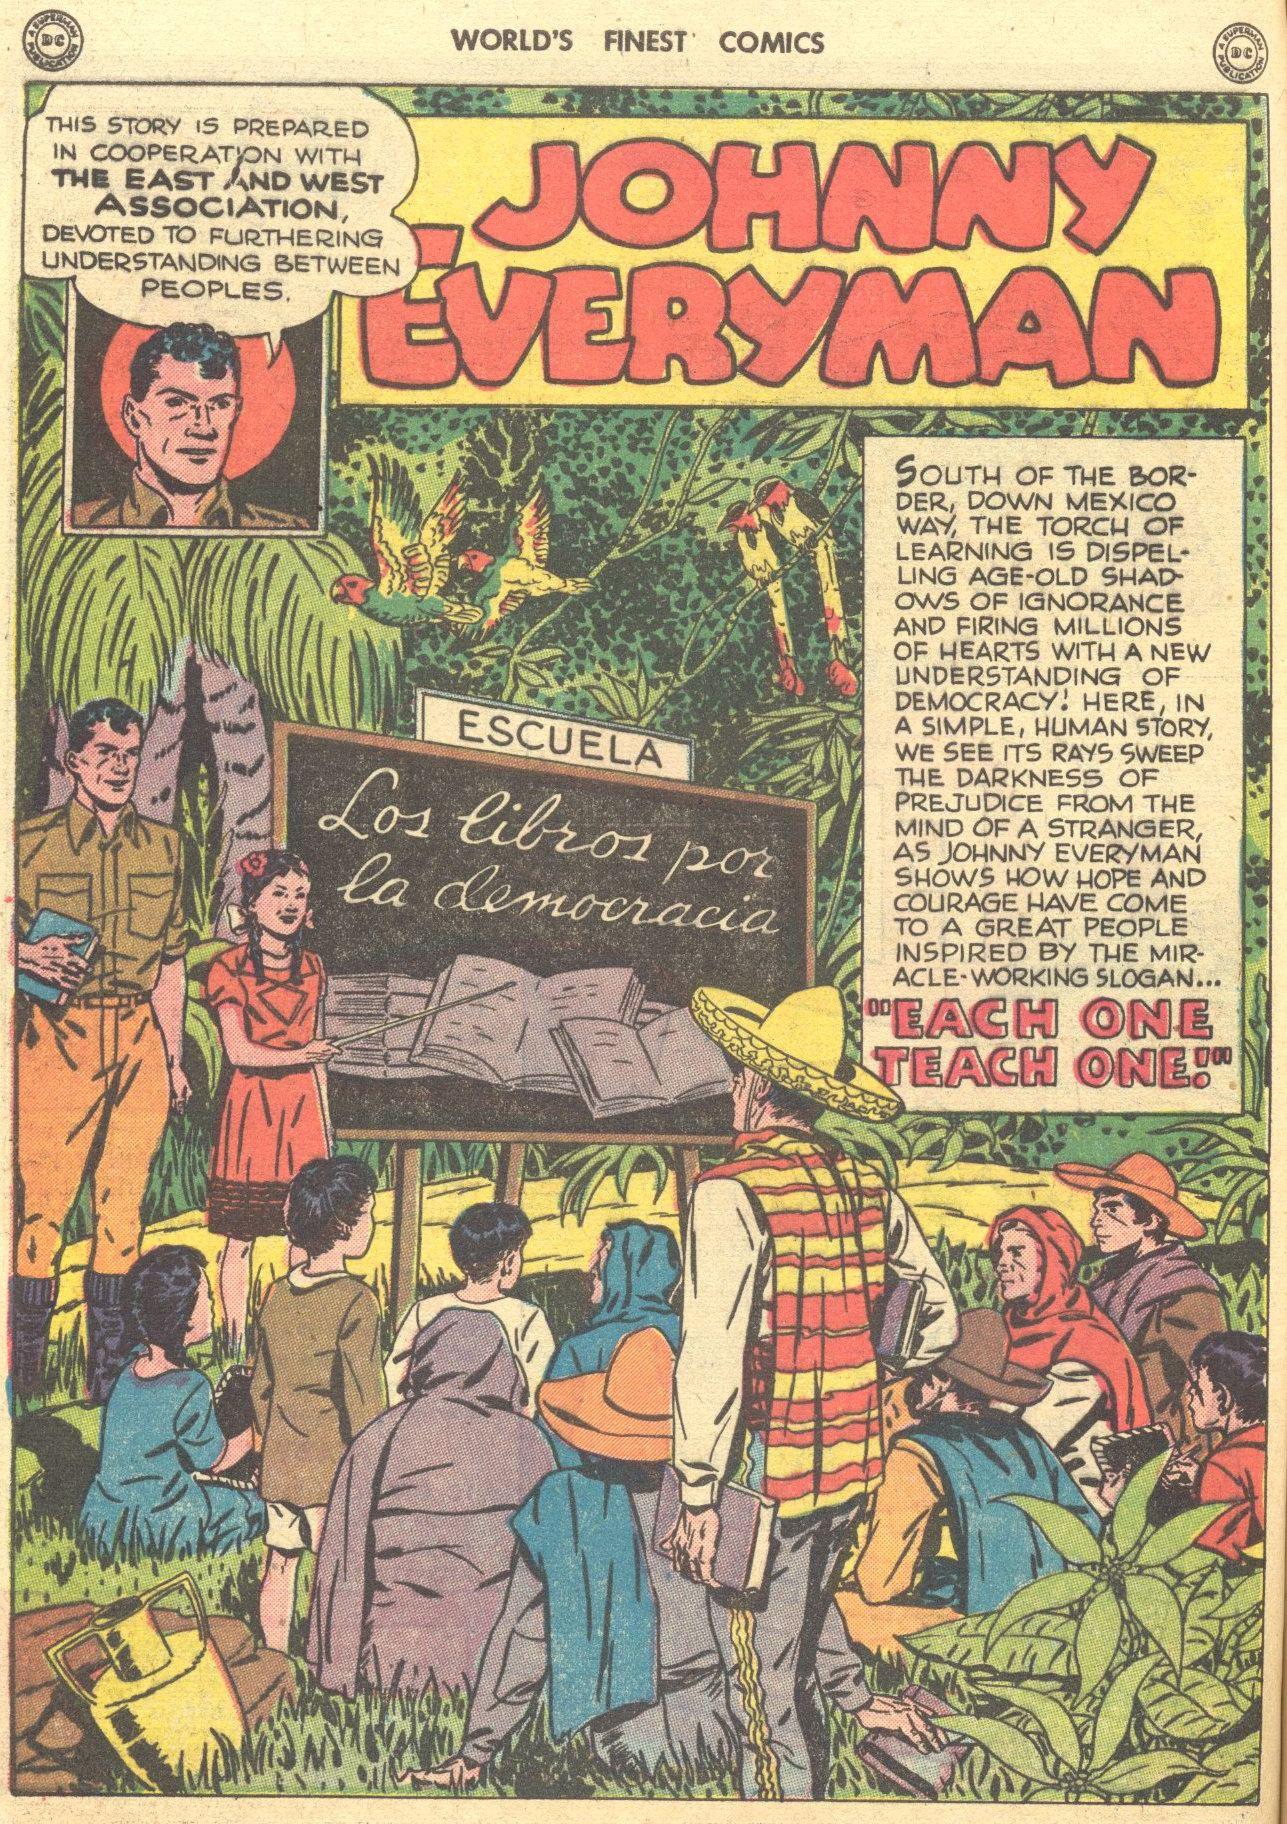 Read online World's Finest Comics comic -  Issue #28 - 51